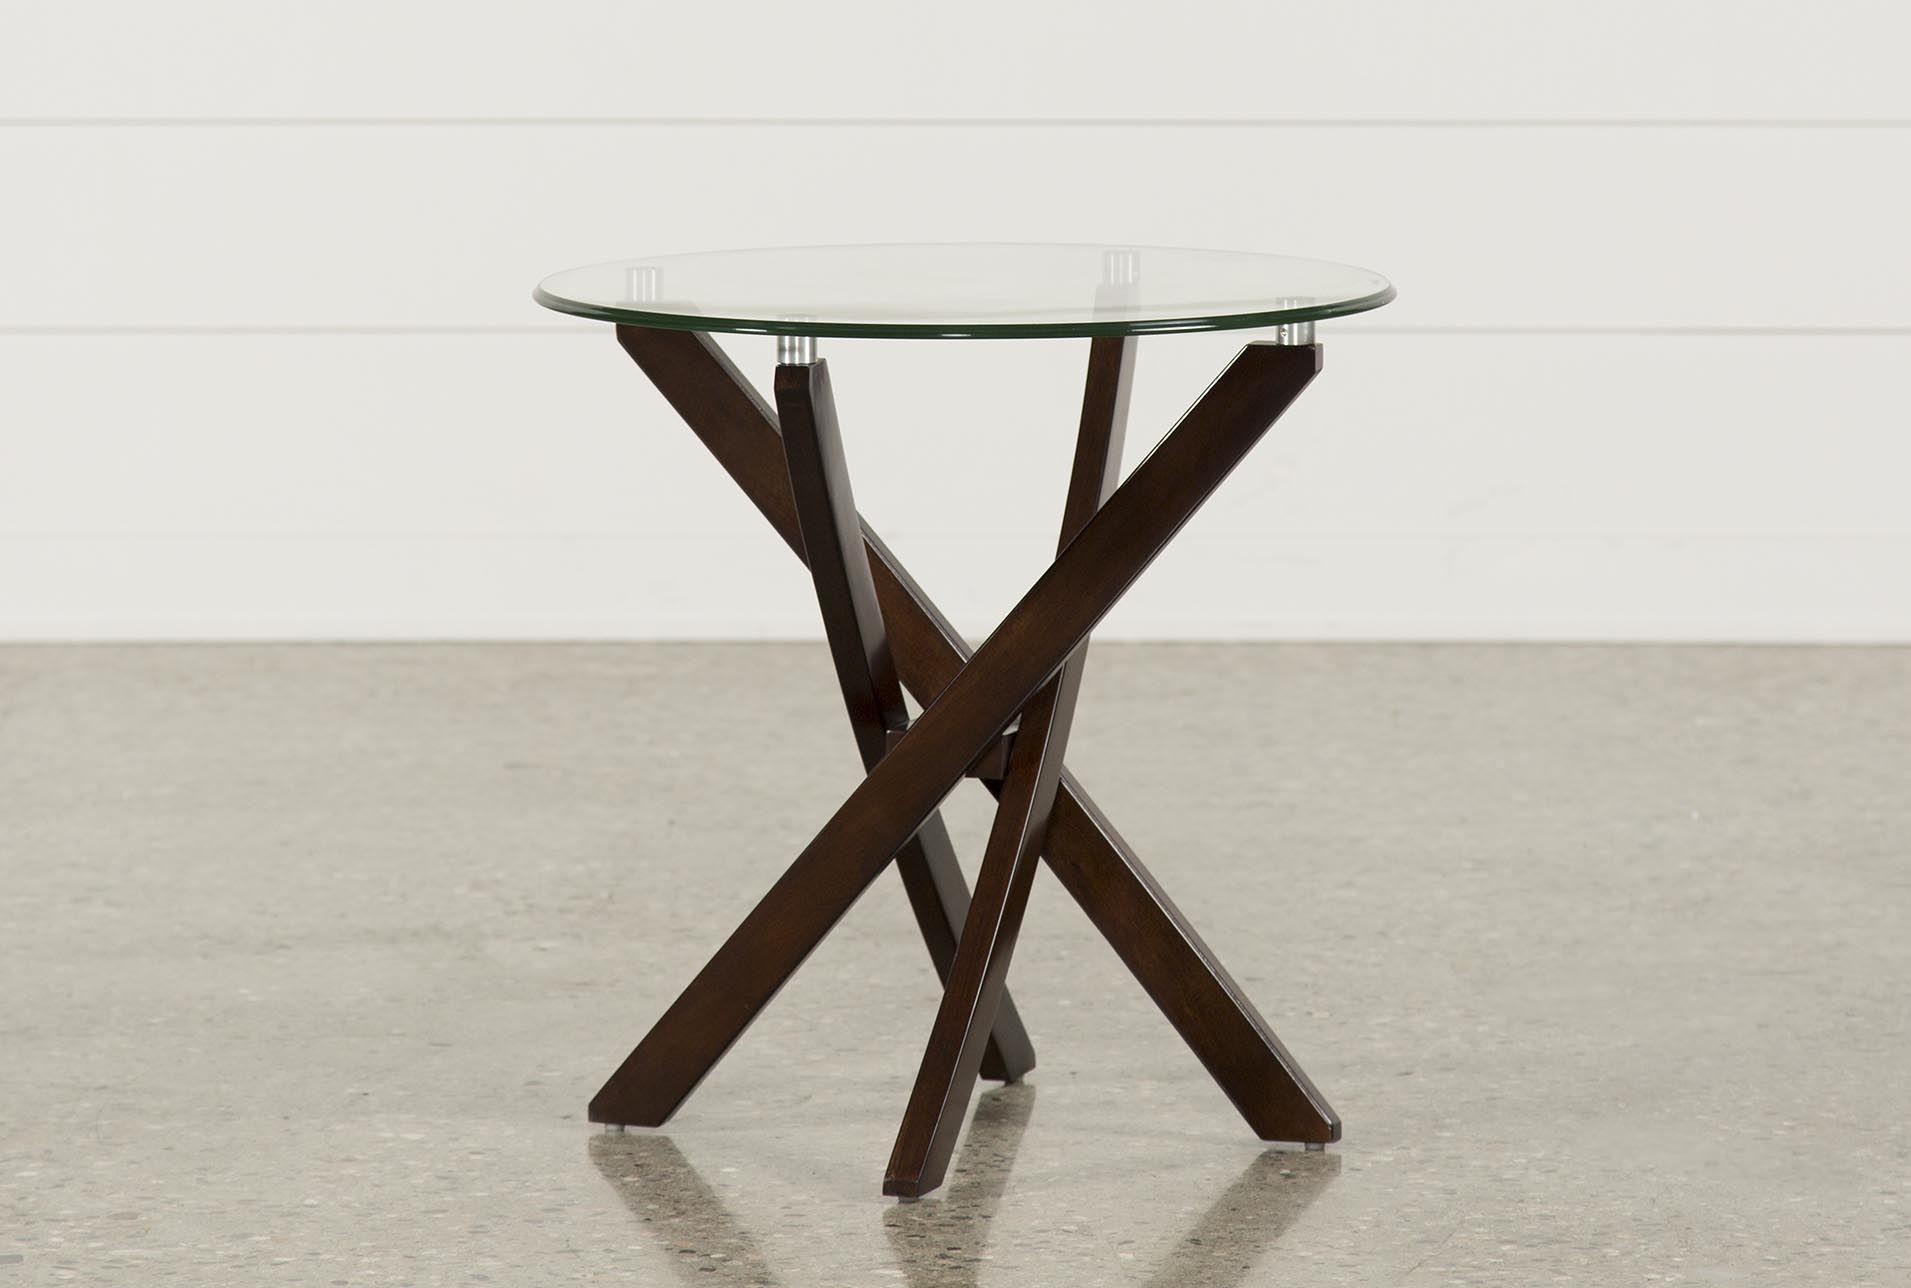 Kit Brisbane End Table End Tables Table Furniture [ 1288 x 1911 Pixel ]